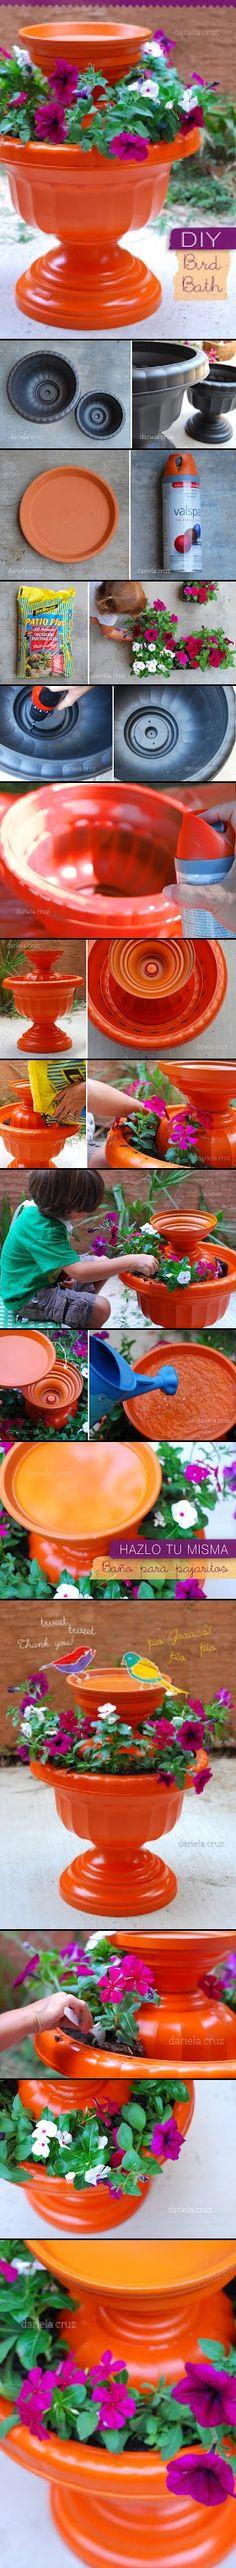 DIY Birdbath Planter -Cheap Easy Up-cycle Garden Bird Bath Feeder- Bird Feeder Garden Crafts, Garden Projects, Do It Yourself Baby, Diy Bird Bath, Pot Jardin, Outdoor Projects, Yard Art, Lawn And Garden, Garden Inspiration